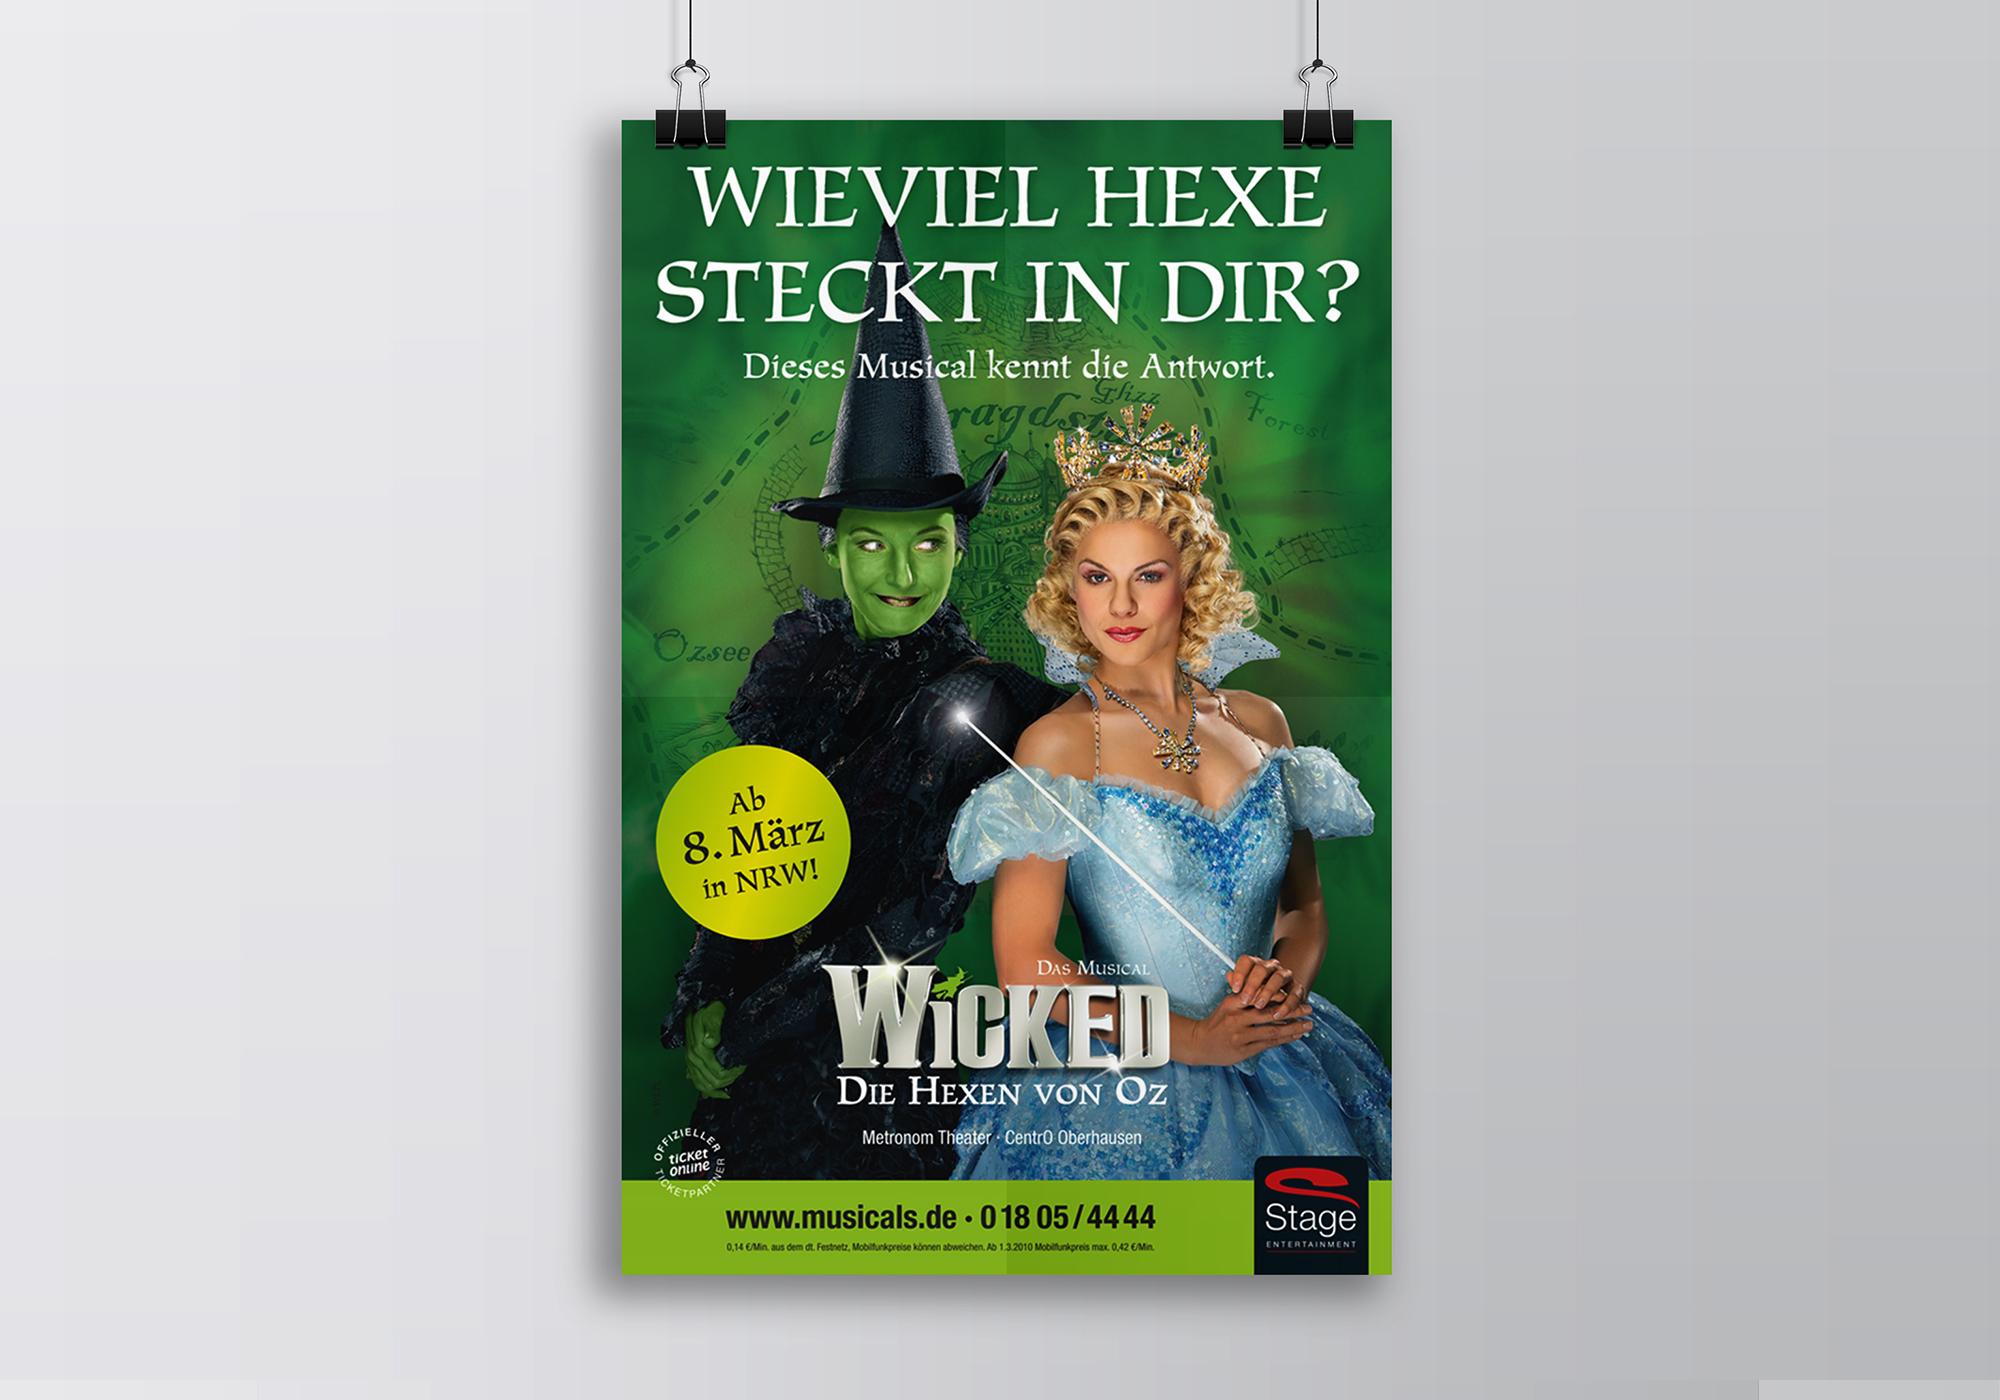 001_Wicked_Keyvisual_B